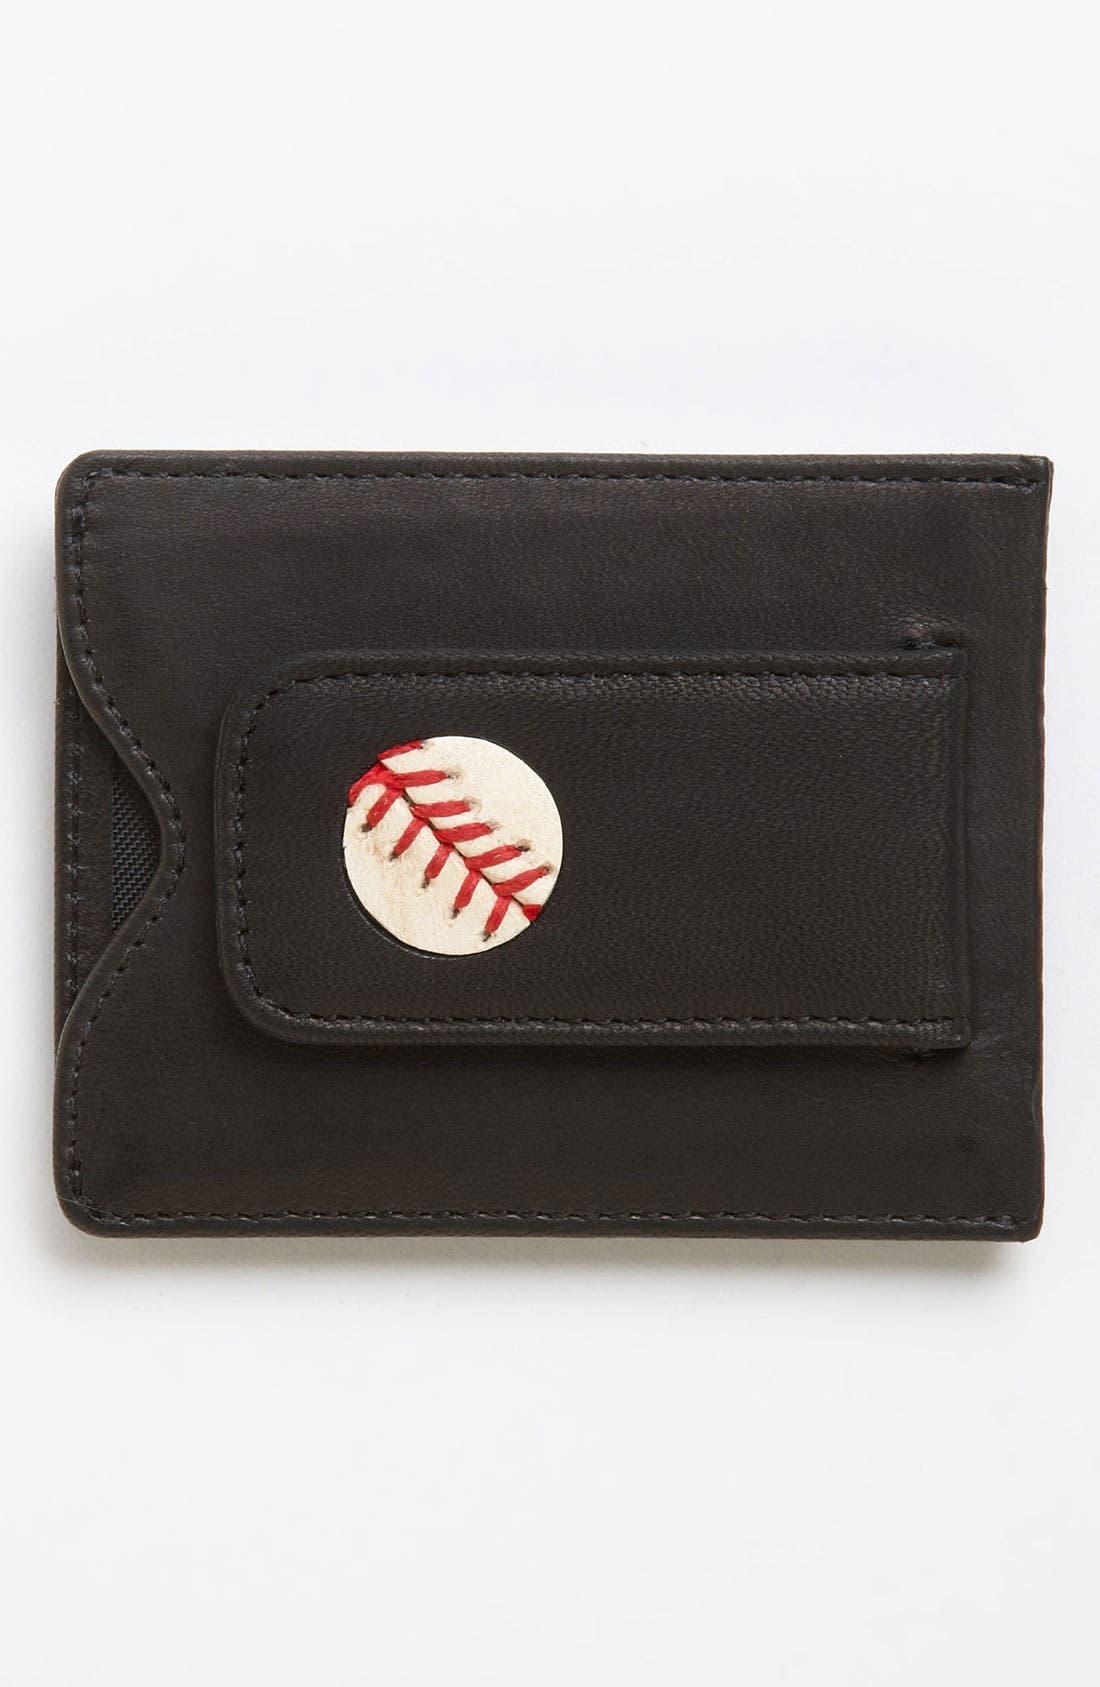 Alternate Image 1 Selected - Tokens & Icons 'New York Yankees' MLB™ Game-Played-Baseball Card Case